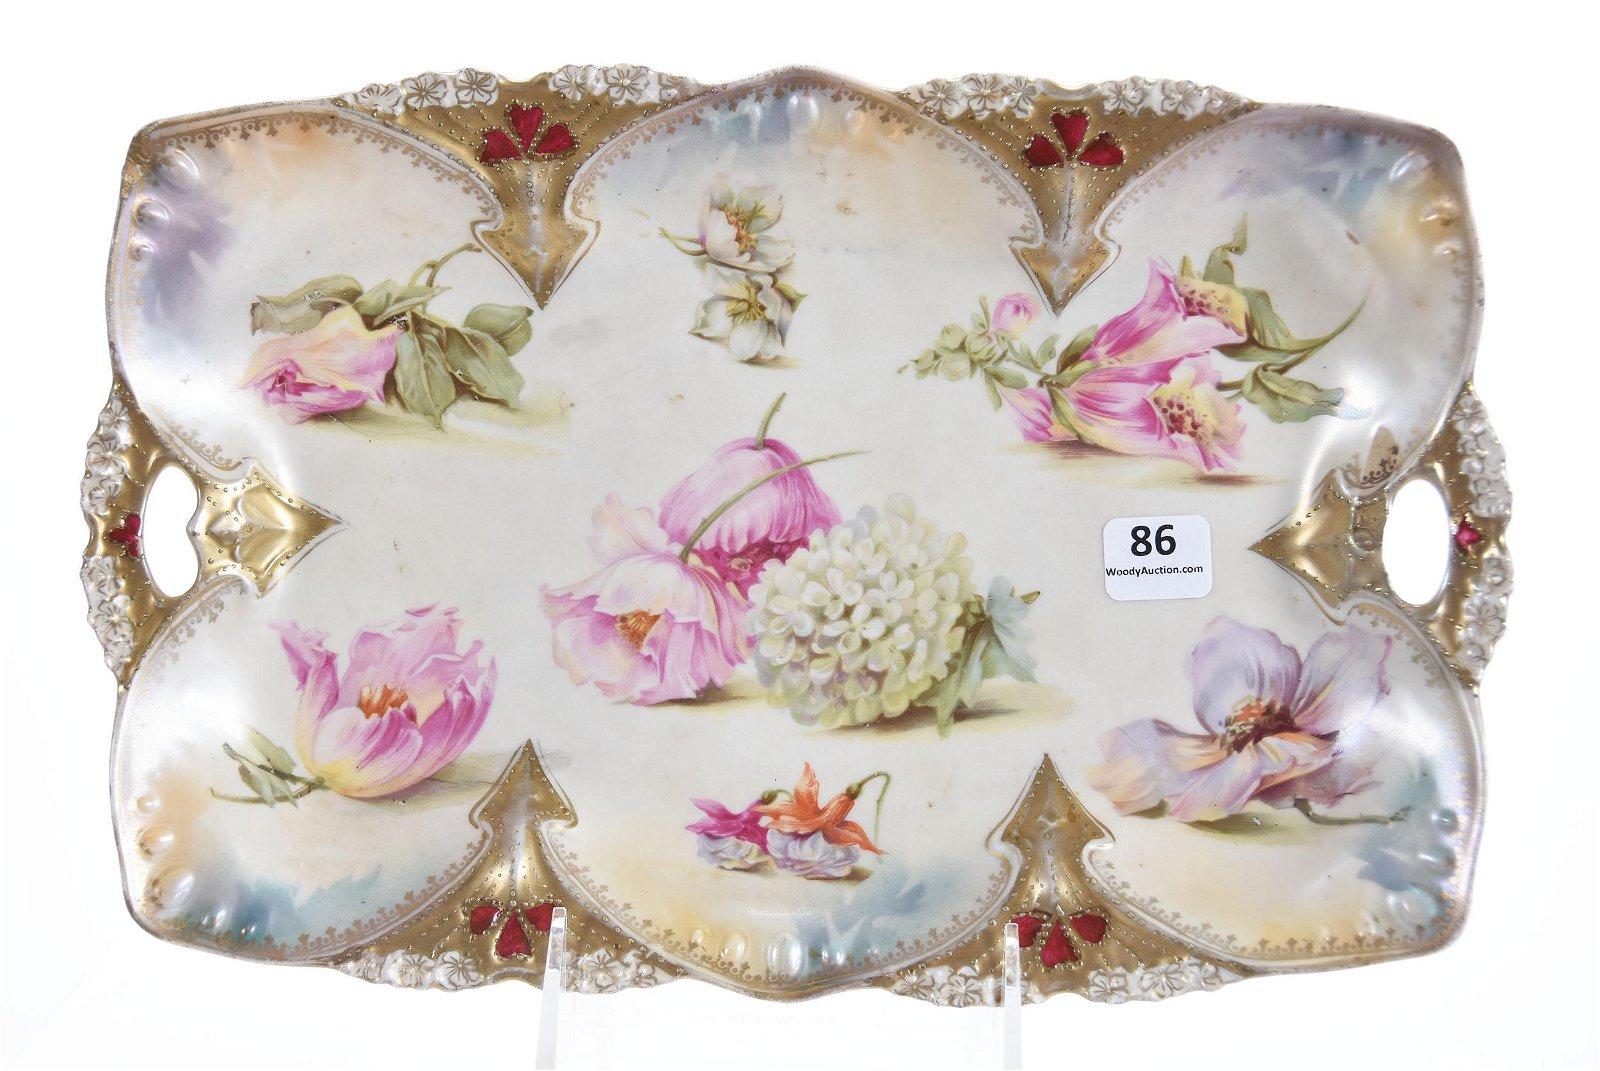 Dresser Tray, Mold 82, Marked RSP, Scattered Floral